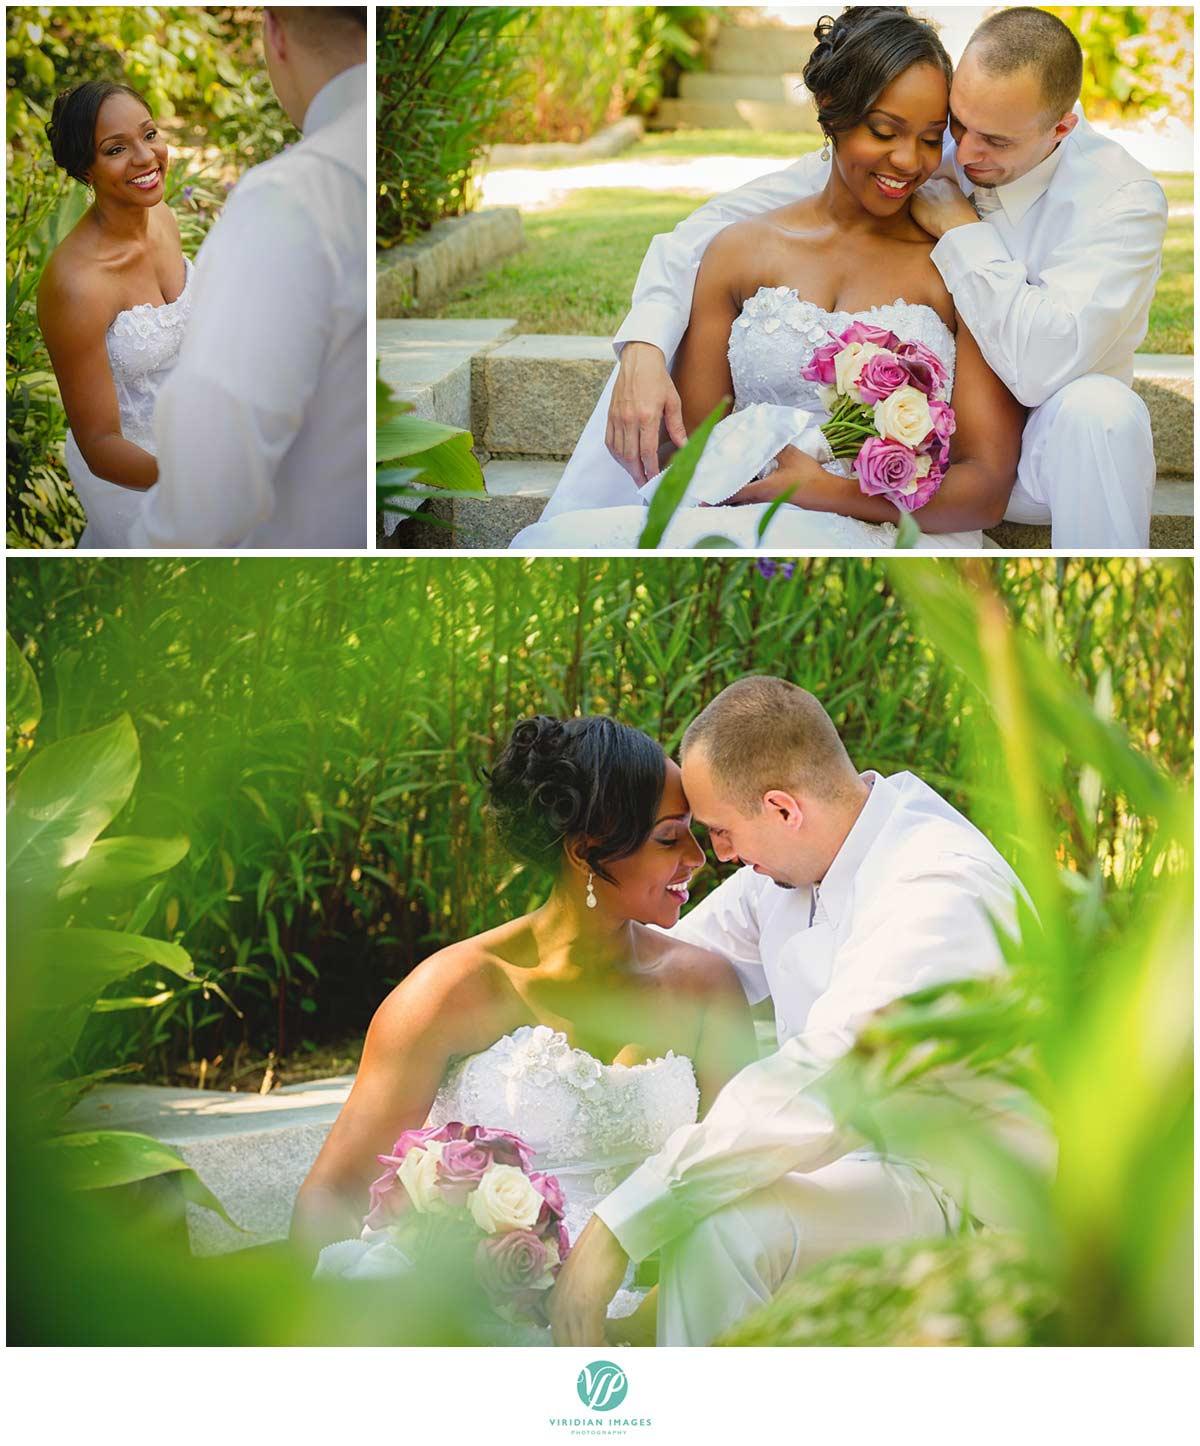 callanwolde-Atalanta-wedding-photographers-bridal-portrait-interracial-photo-22